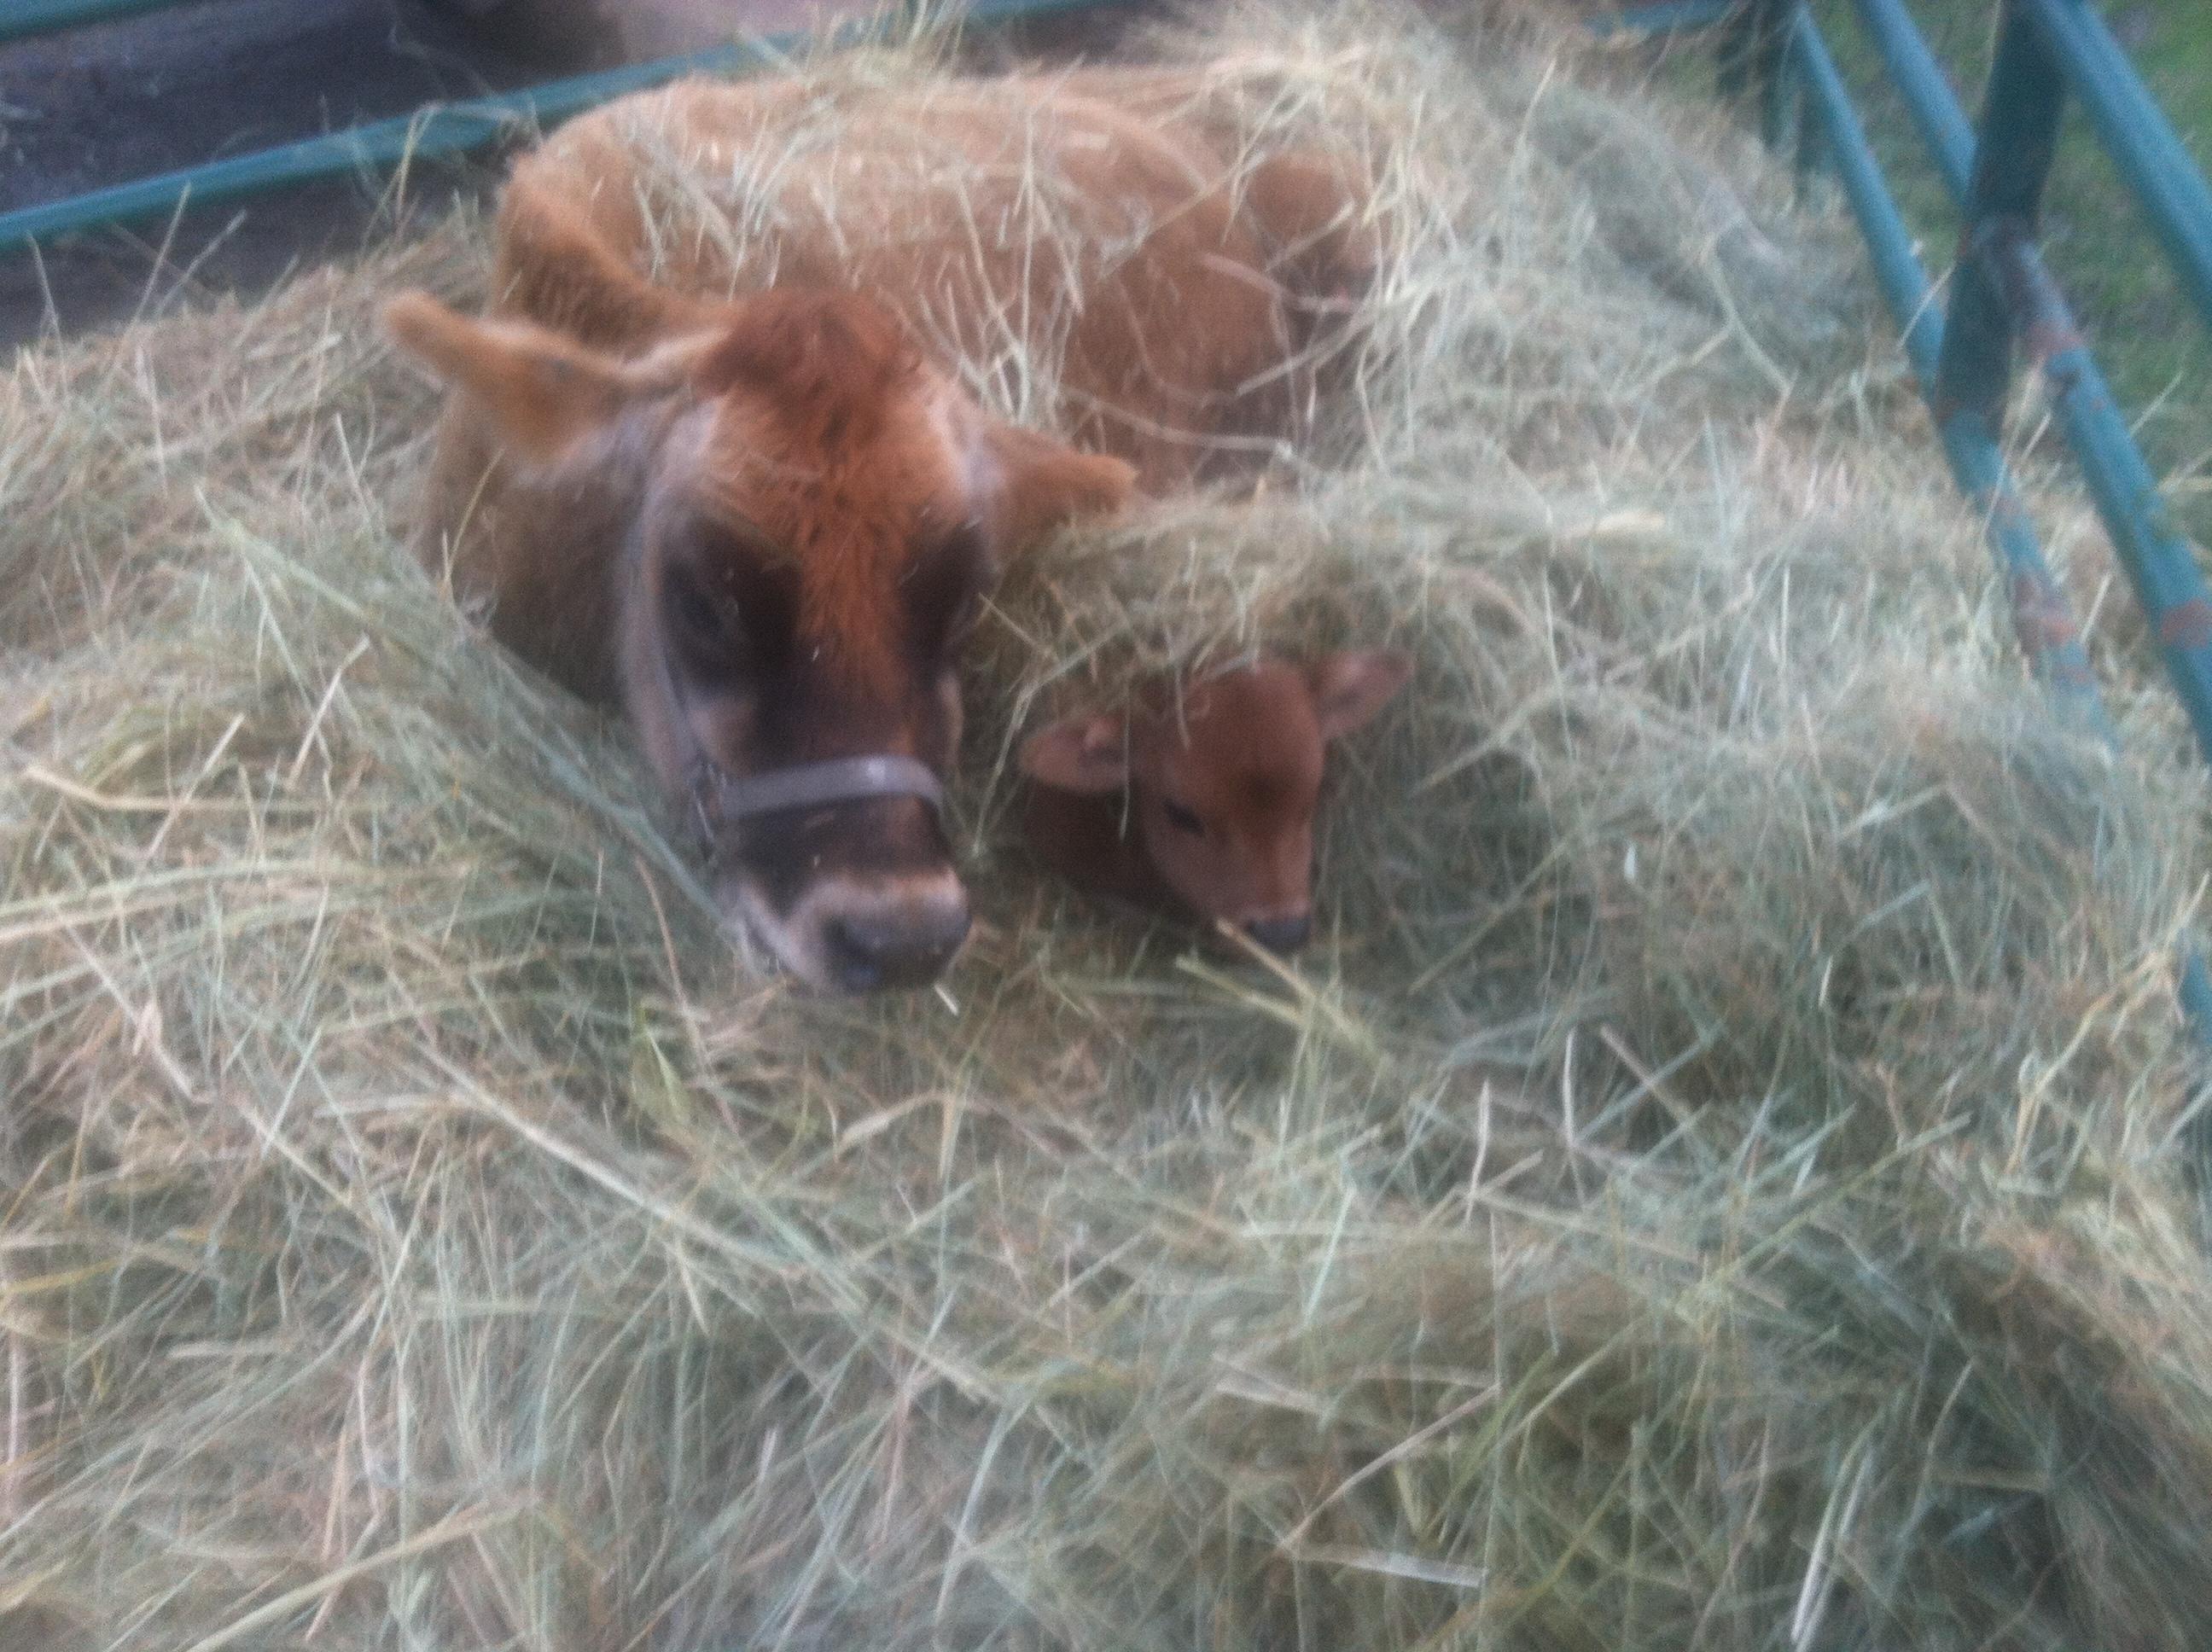 Birth, death, winter, and wild hogs | Helios Farms